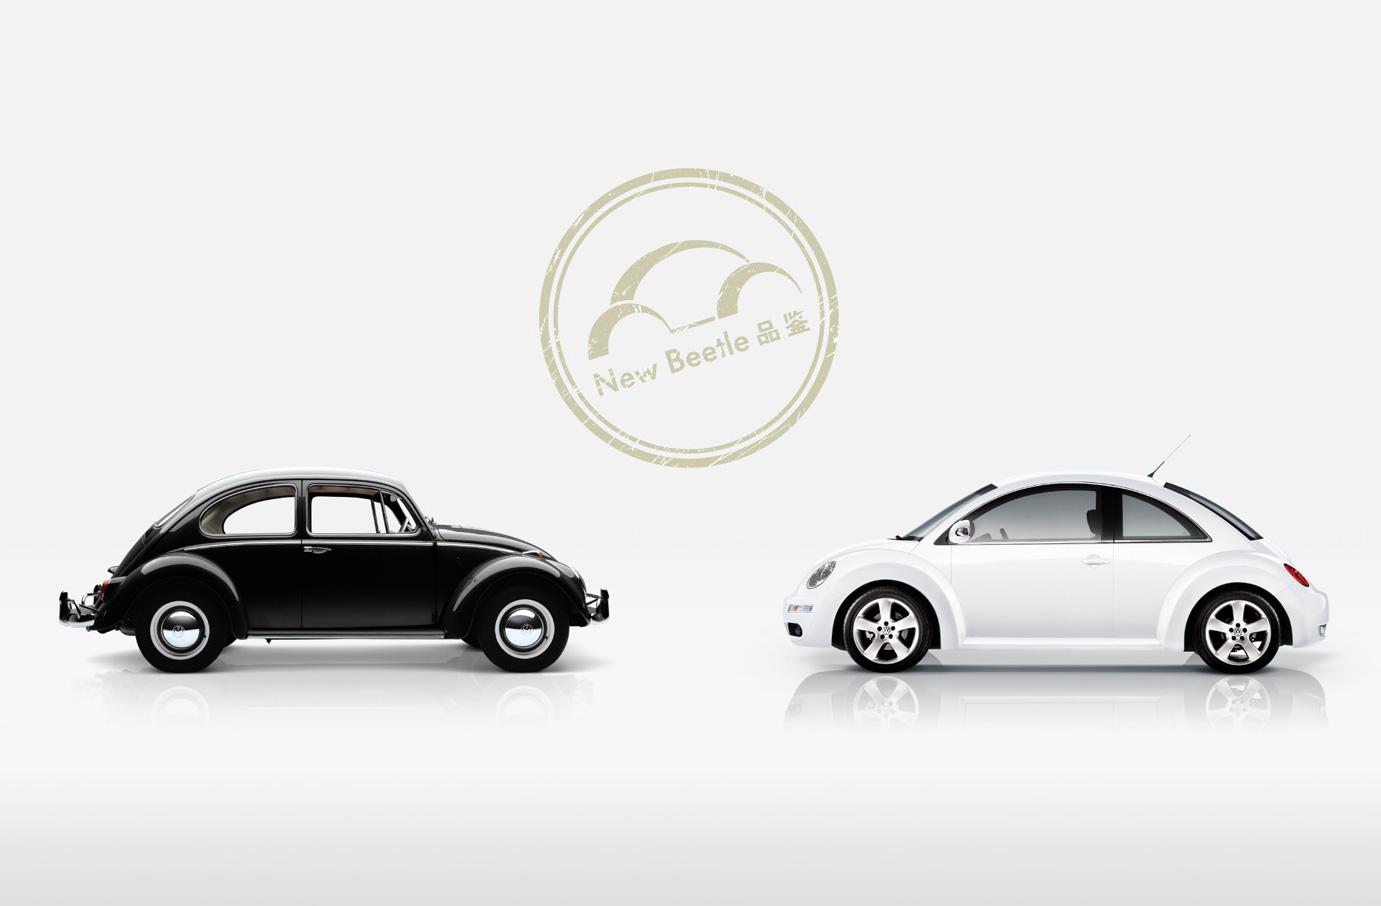 People Car Project Web Platform Launched